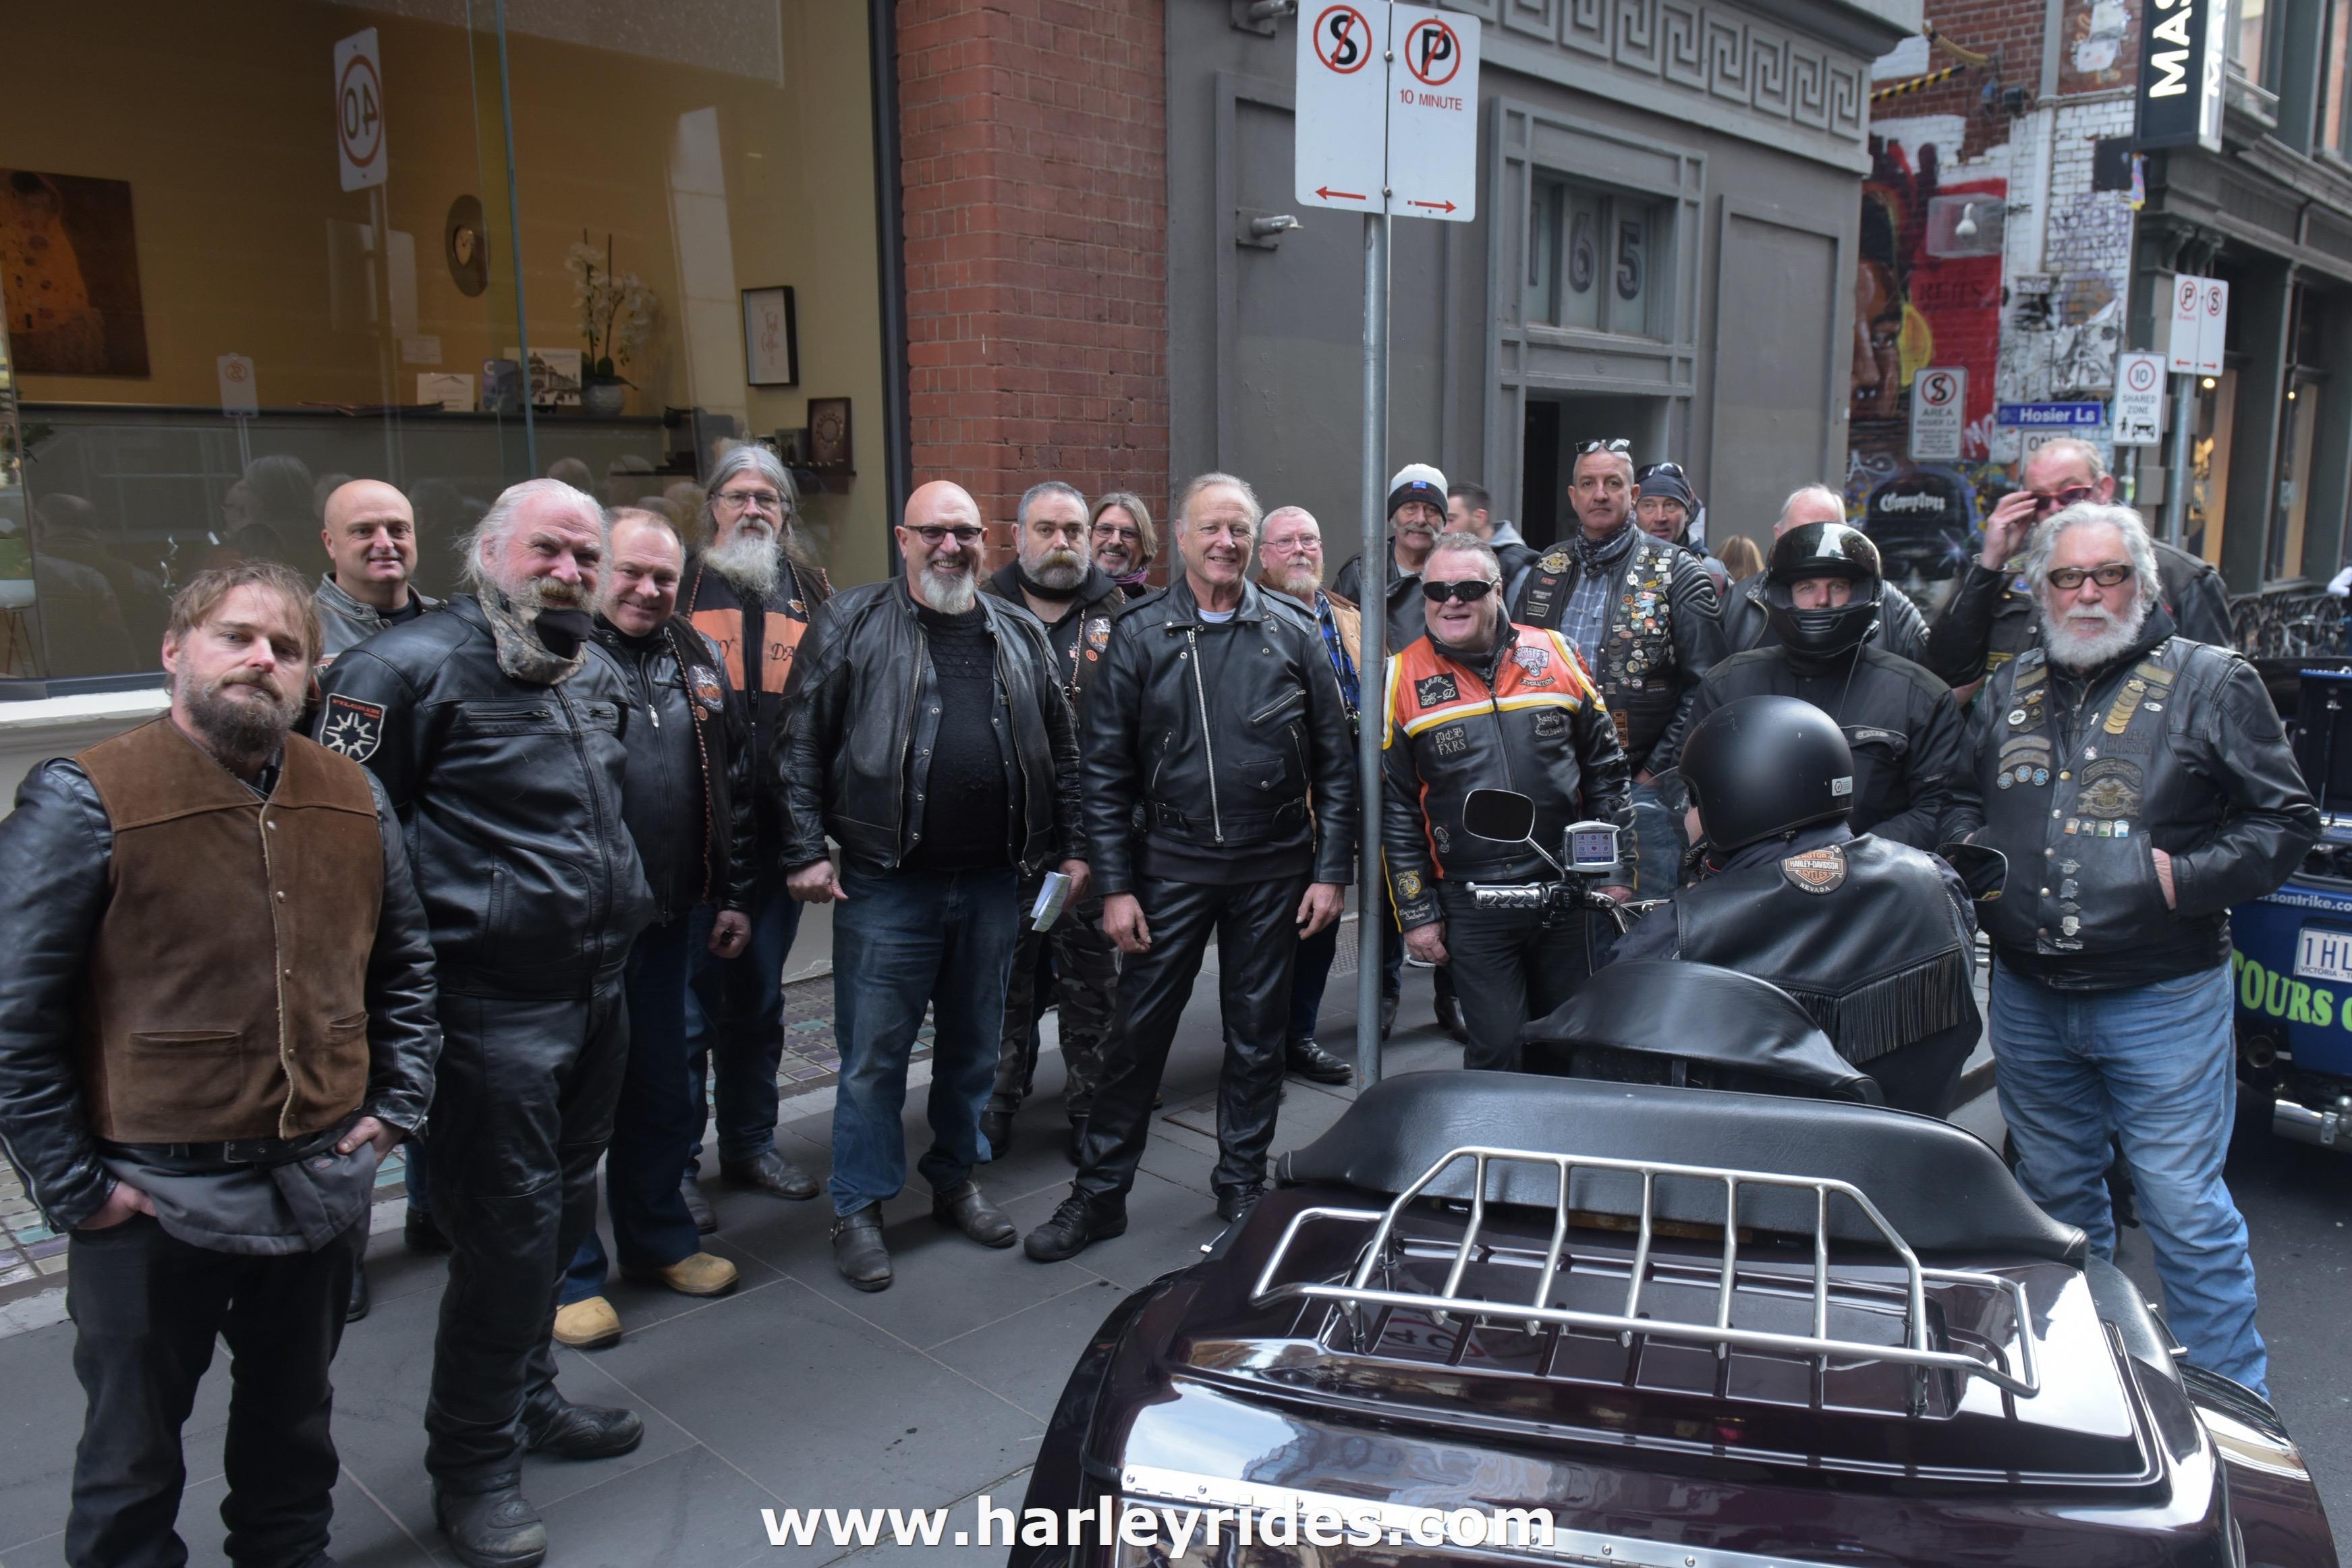 HarleyDavidsonGroupRide (64).jpg